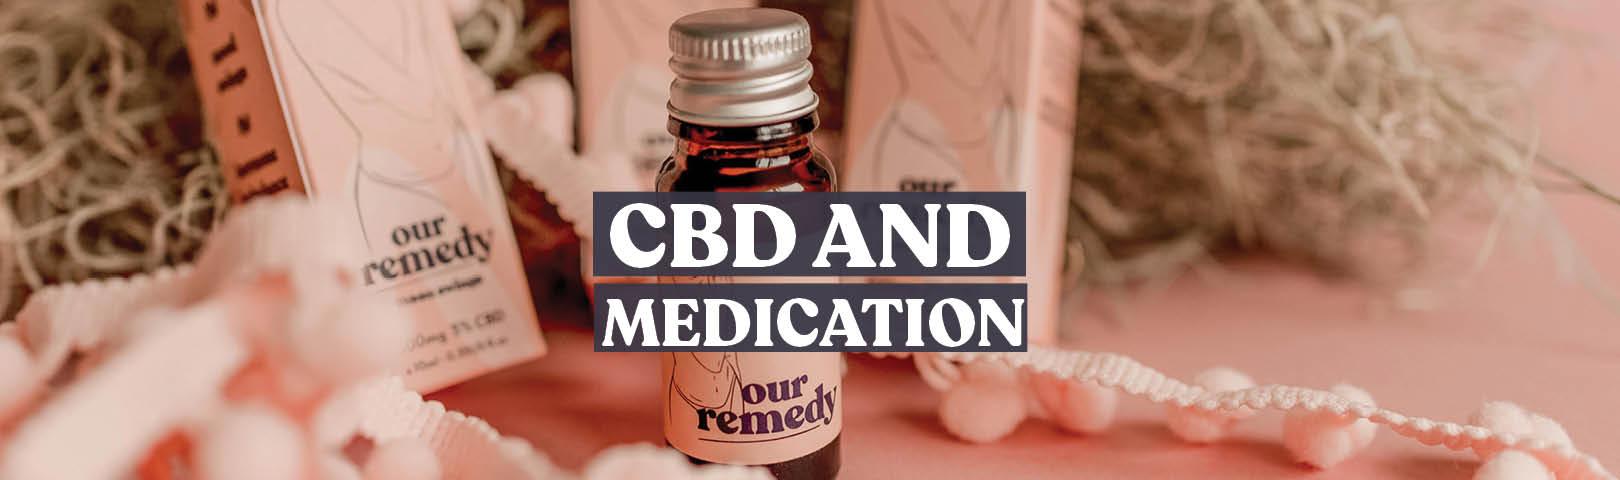 cbd and medication